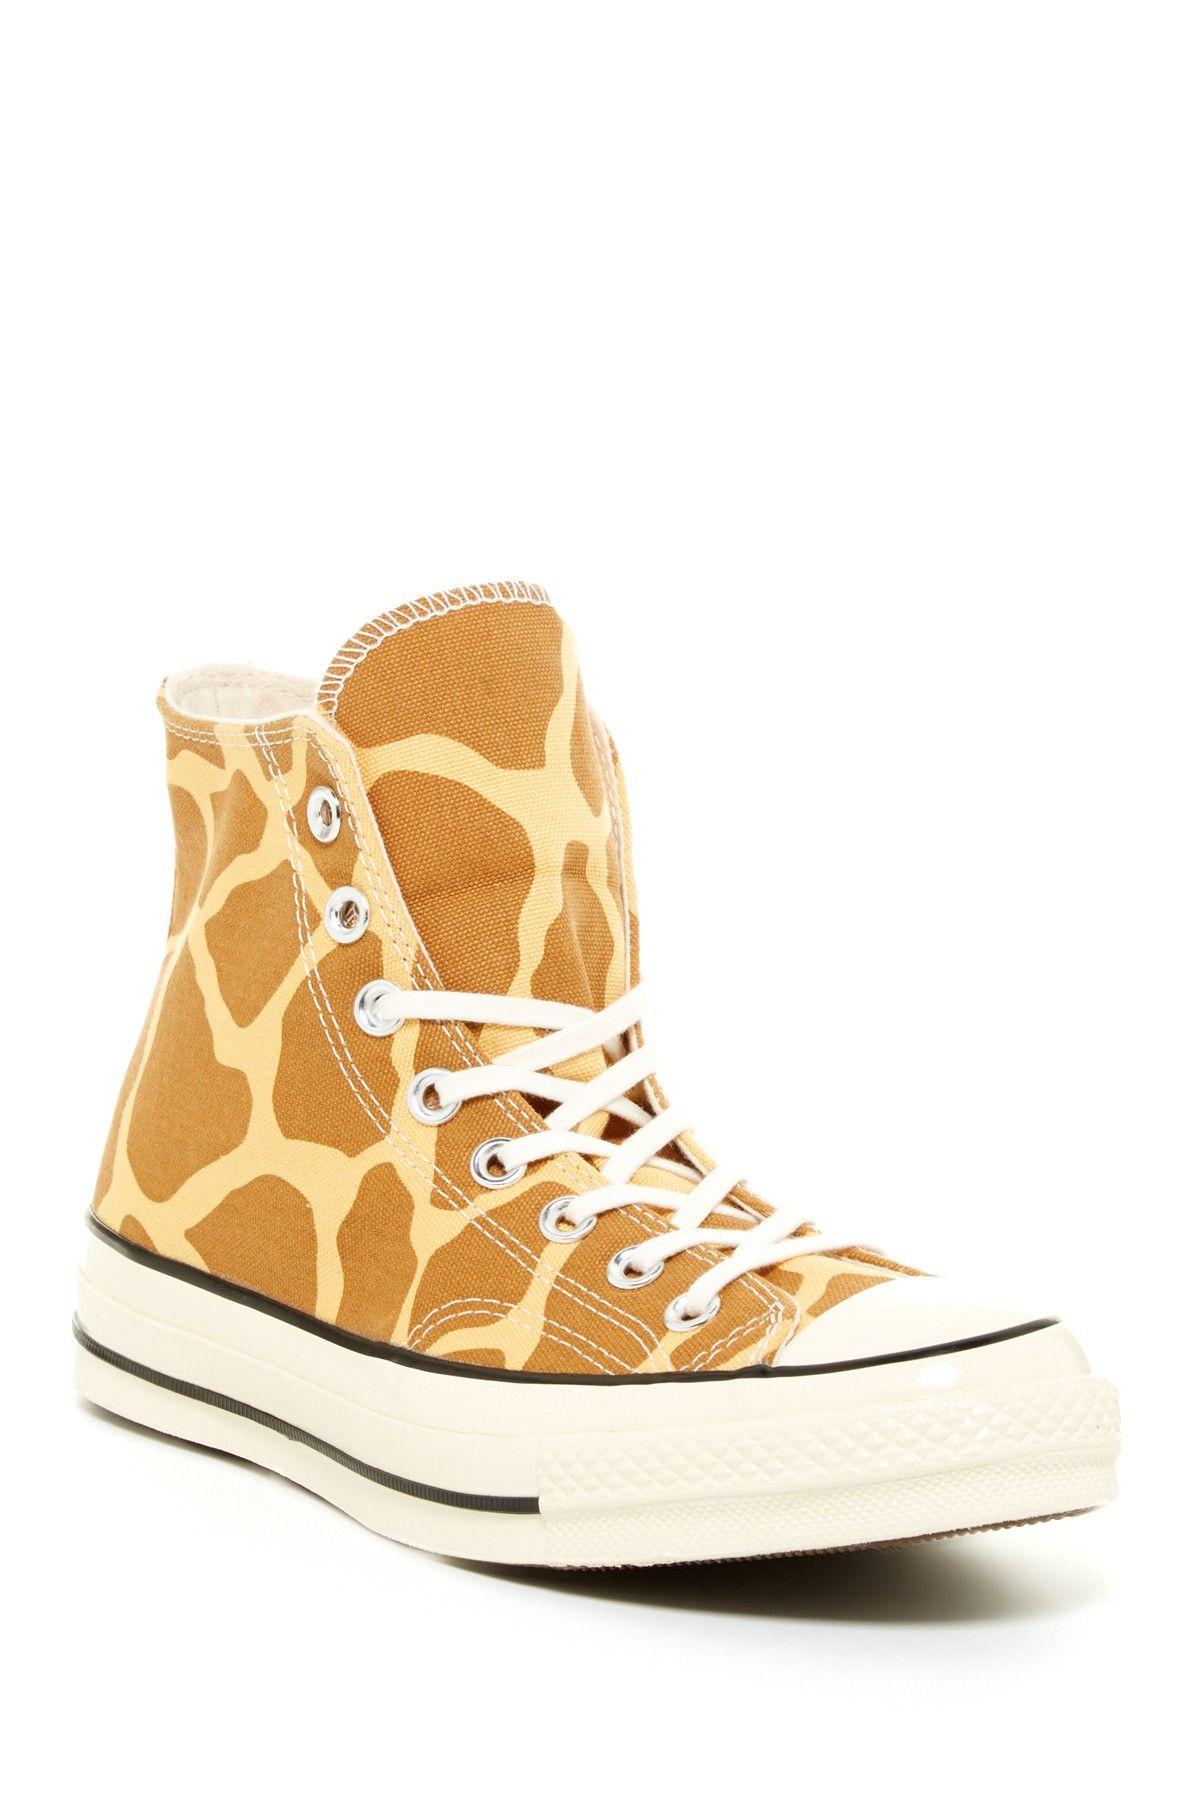 Cool Converse Giraffe Print High Top